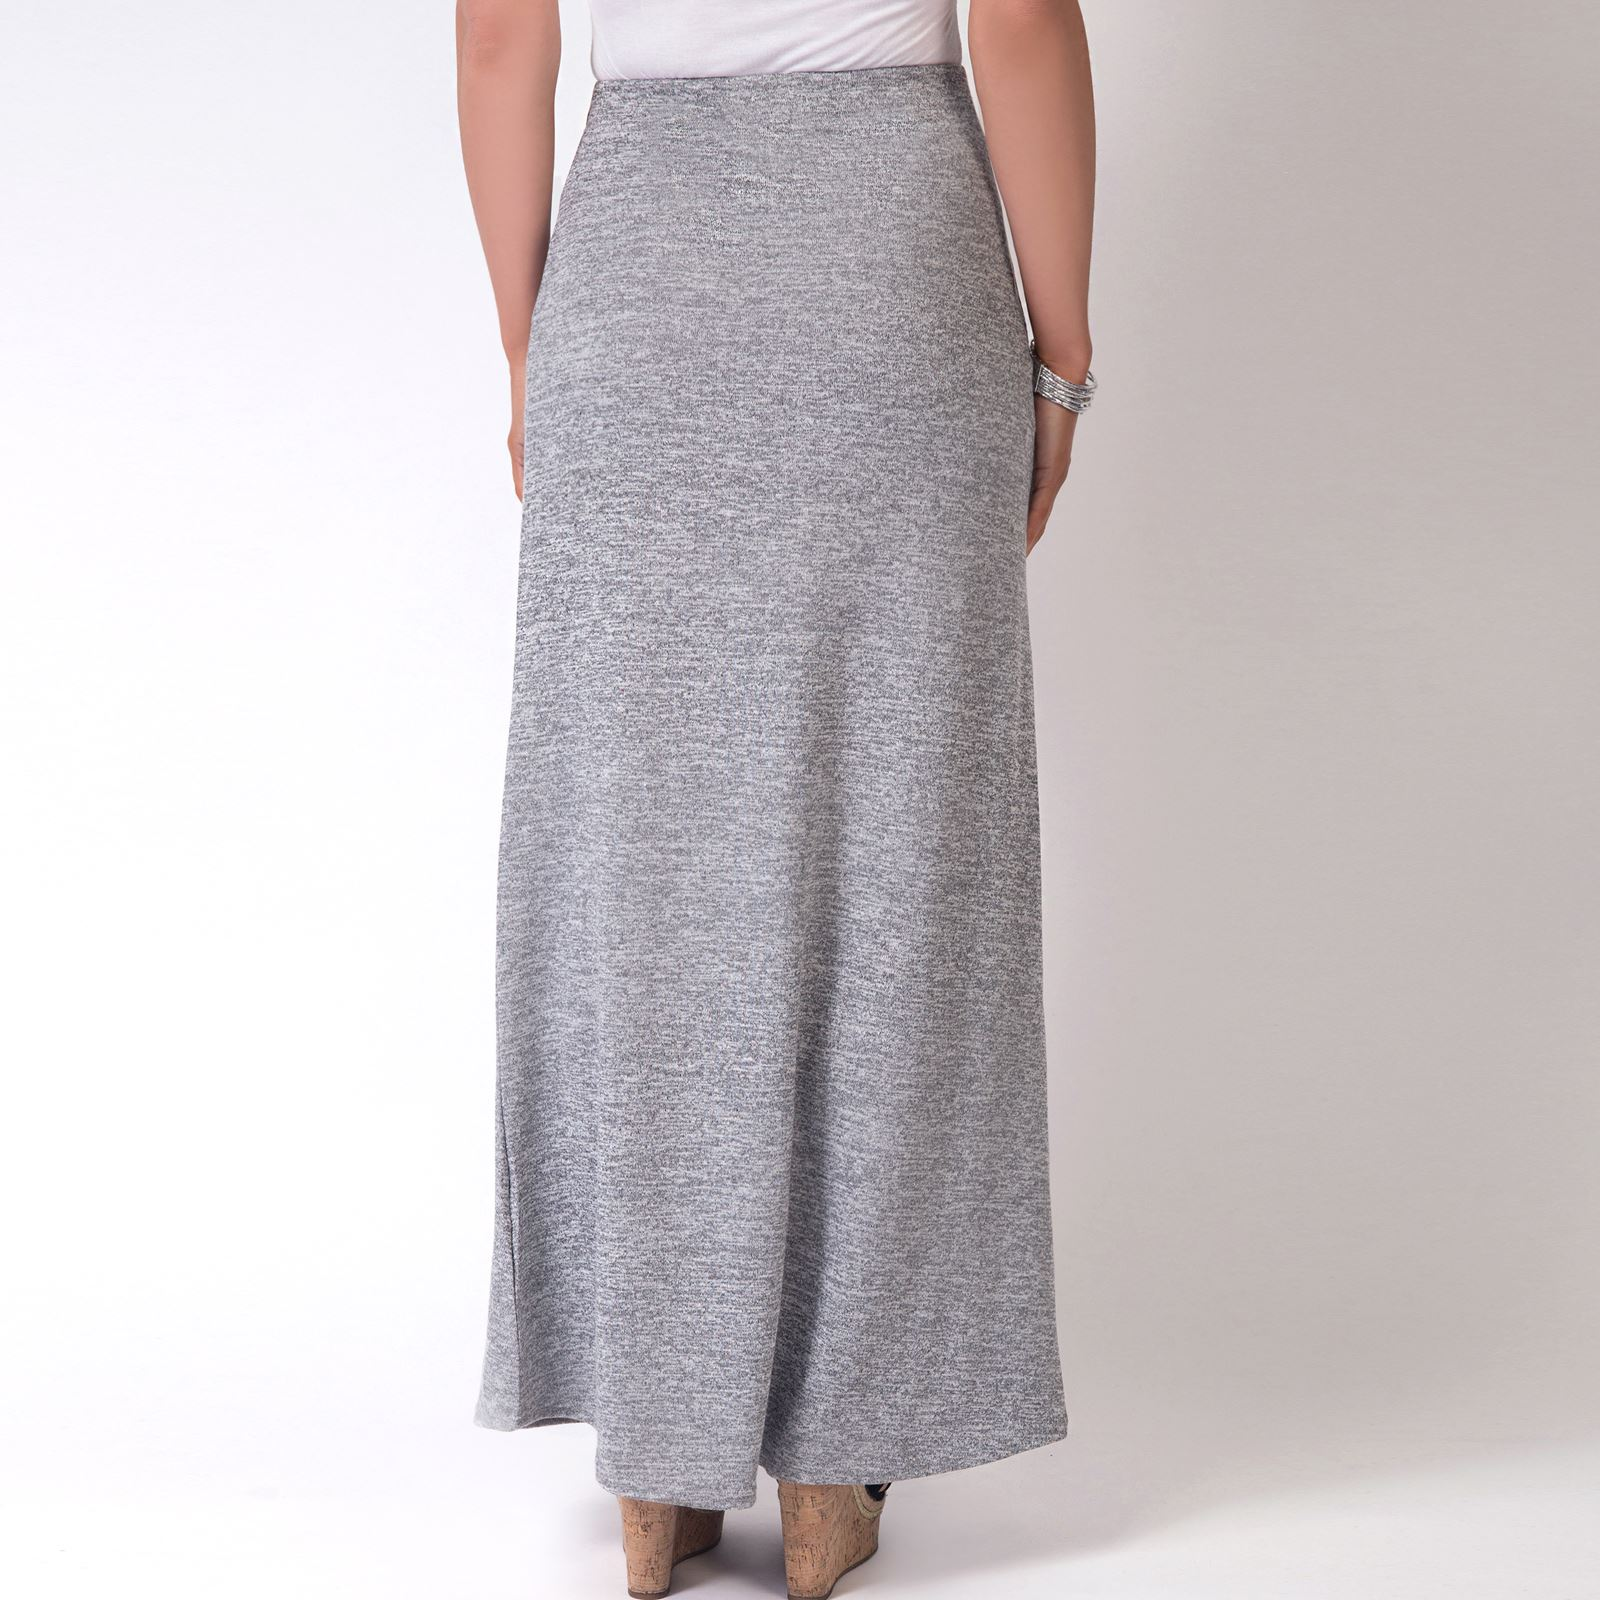 Womens-Ladies-Maxi-Skirt-High-Waist-A-Line-Long-Knit-Stretch-Bodycon-Casual-Boho thumbnail 7